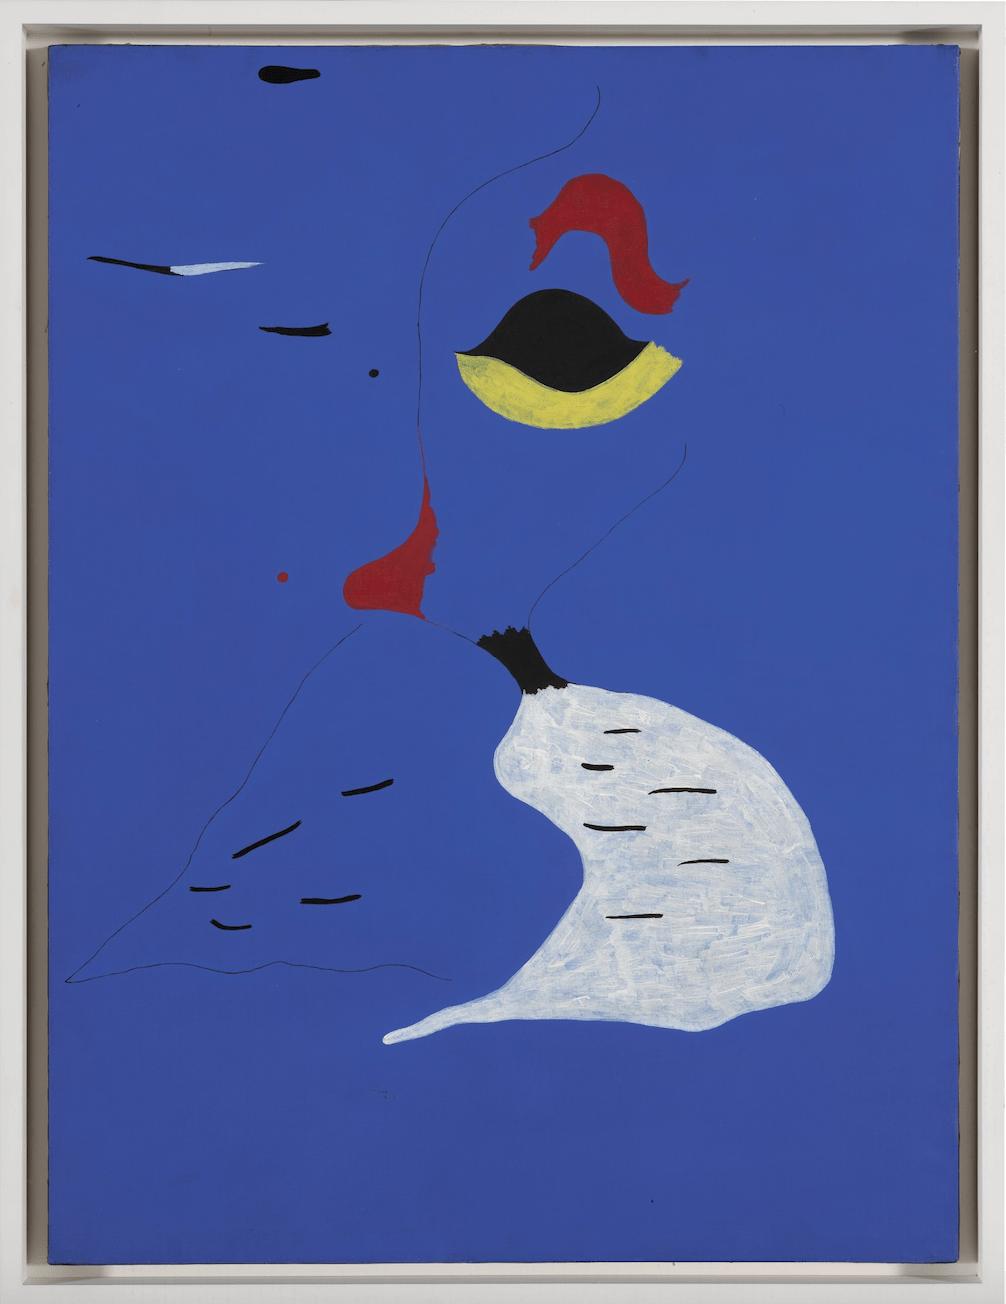 Joan Miró, Peinture (Femme au chapeua rouge), 1927, olie op doek, 130 x 97,2 cm. Lot verkocht voor 22,302,140 GBP